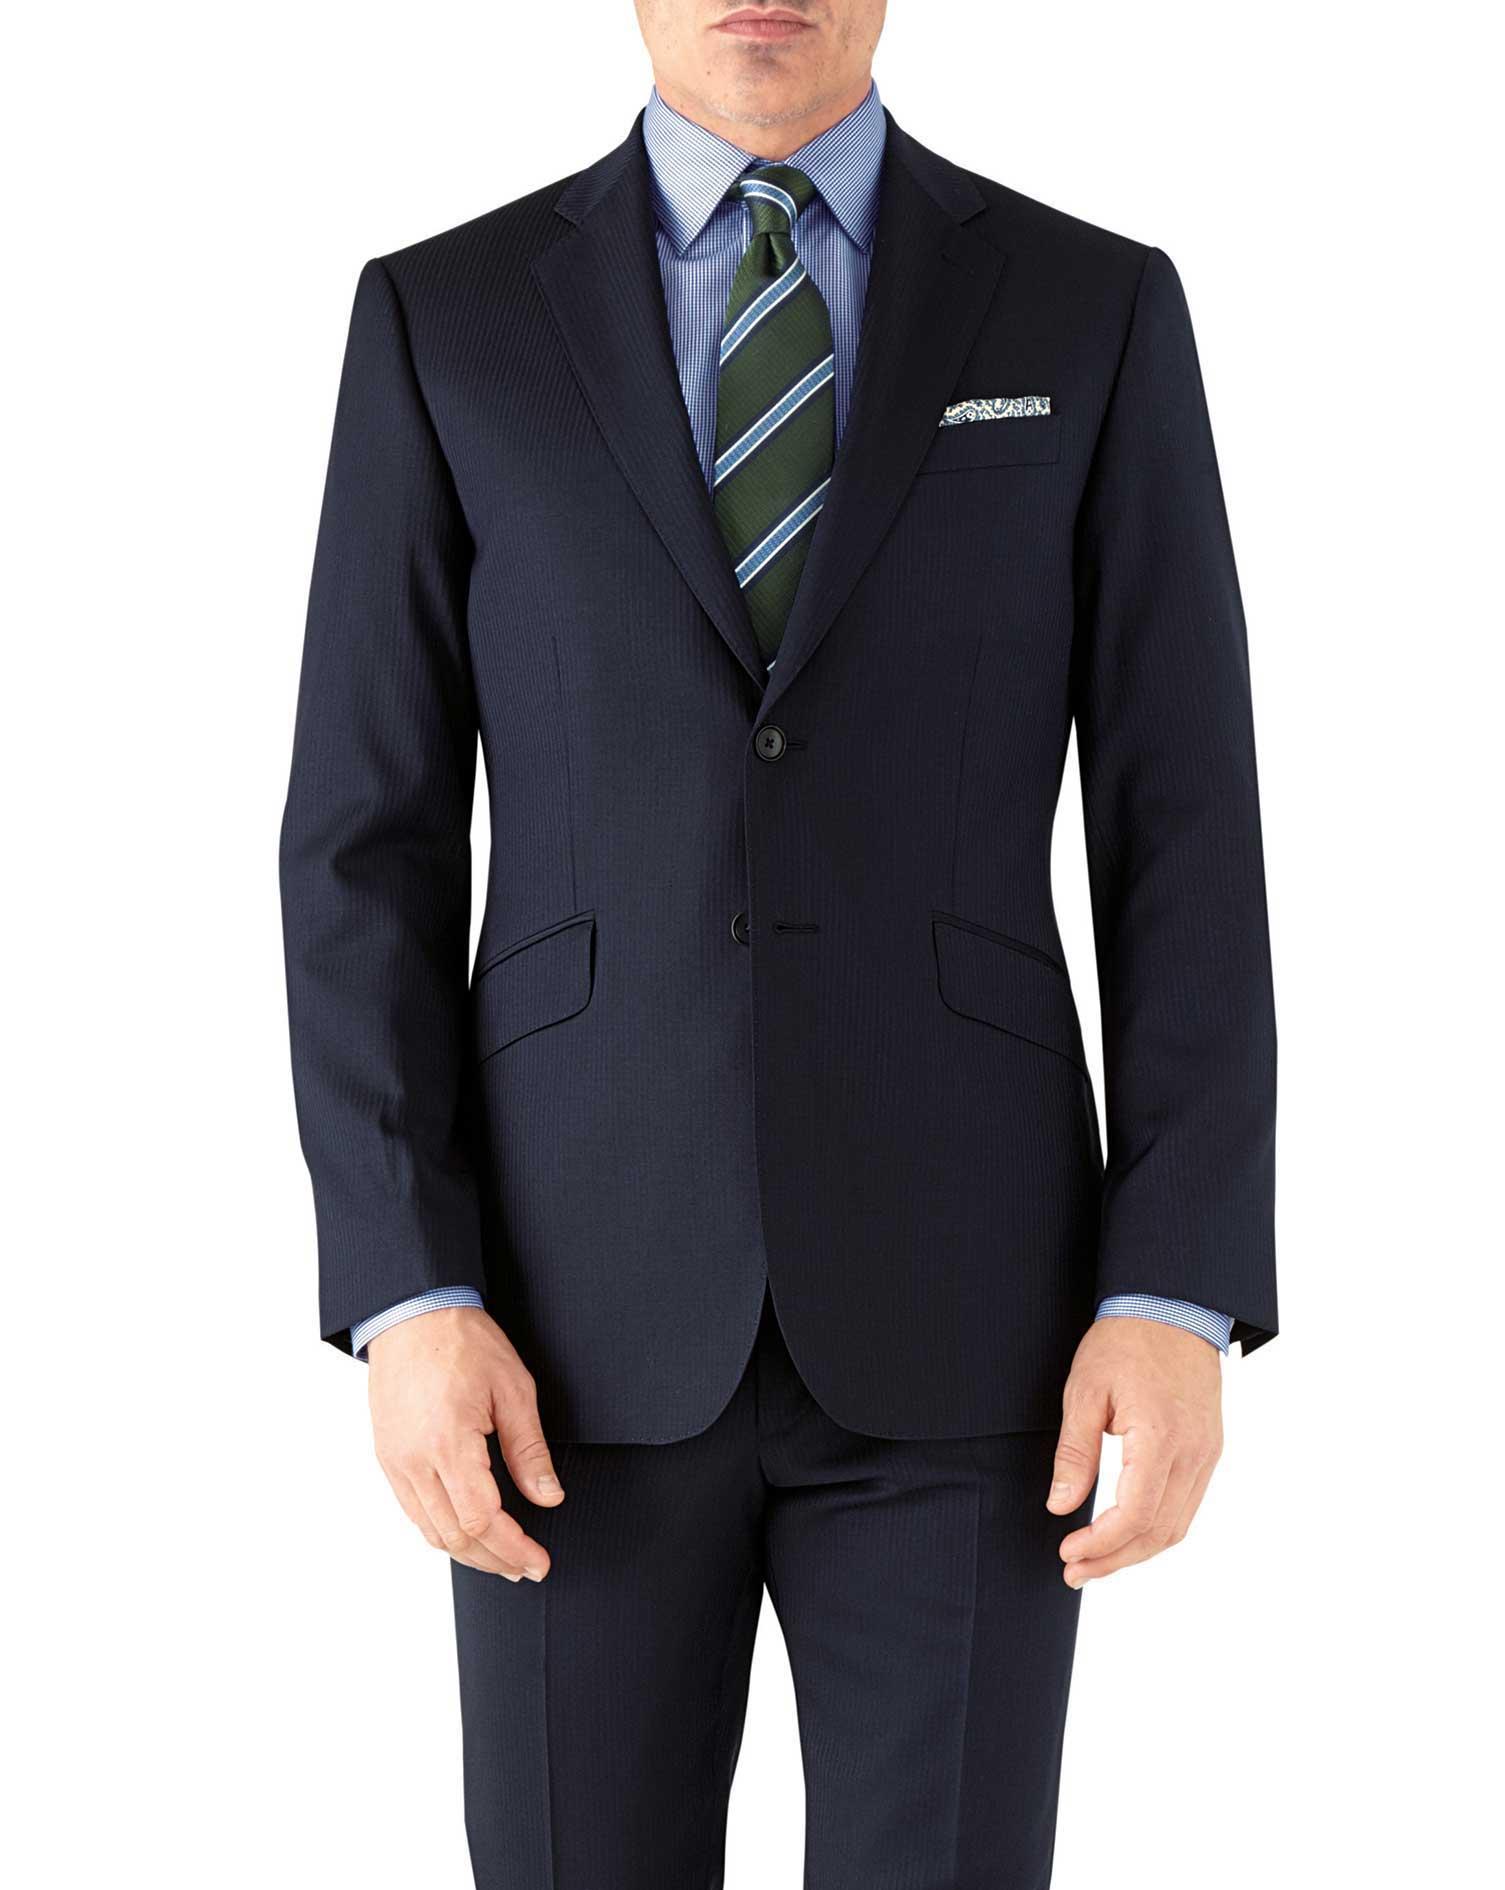 Navy Herringbone Classic Fit Italian Suit Wool Jacket Size 42 Short by Charles Tyrwhitt